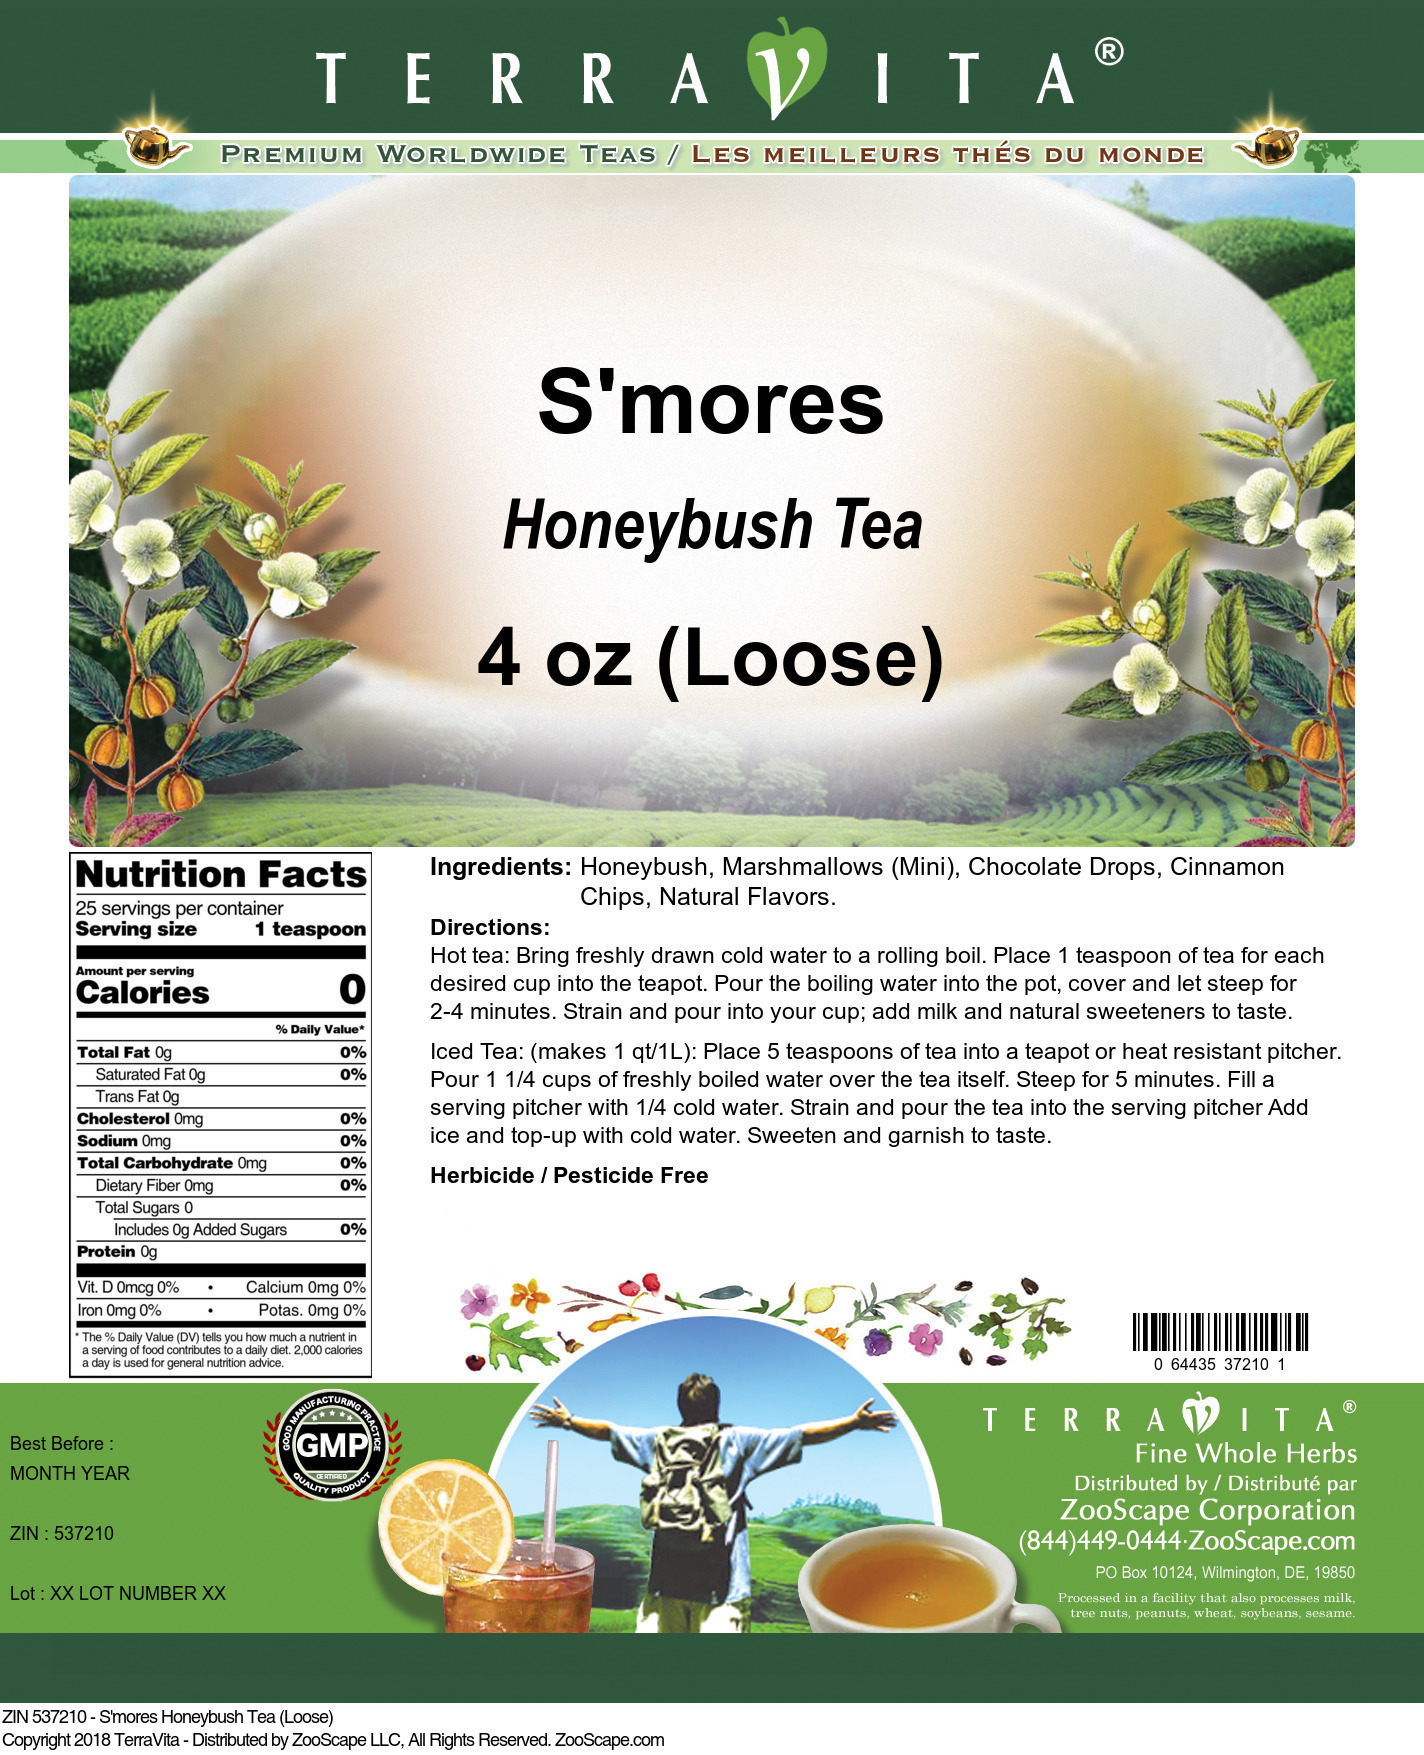 S'mores Honeybush Tea (Loose)